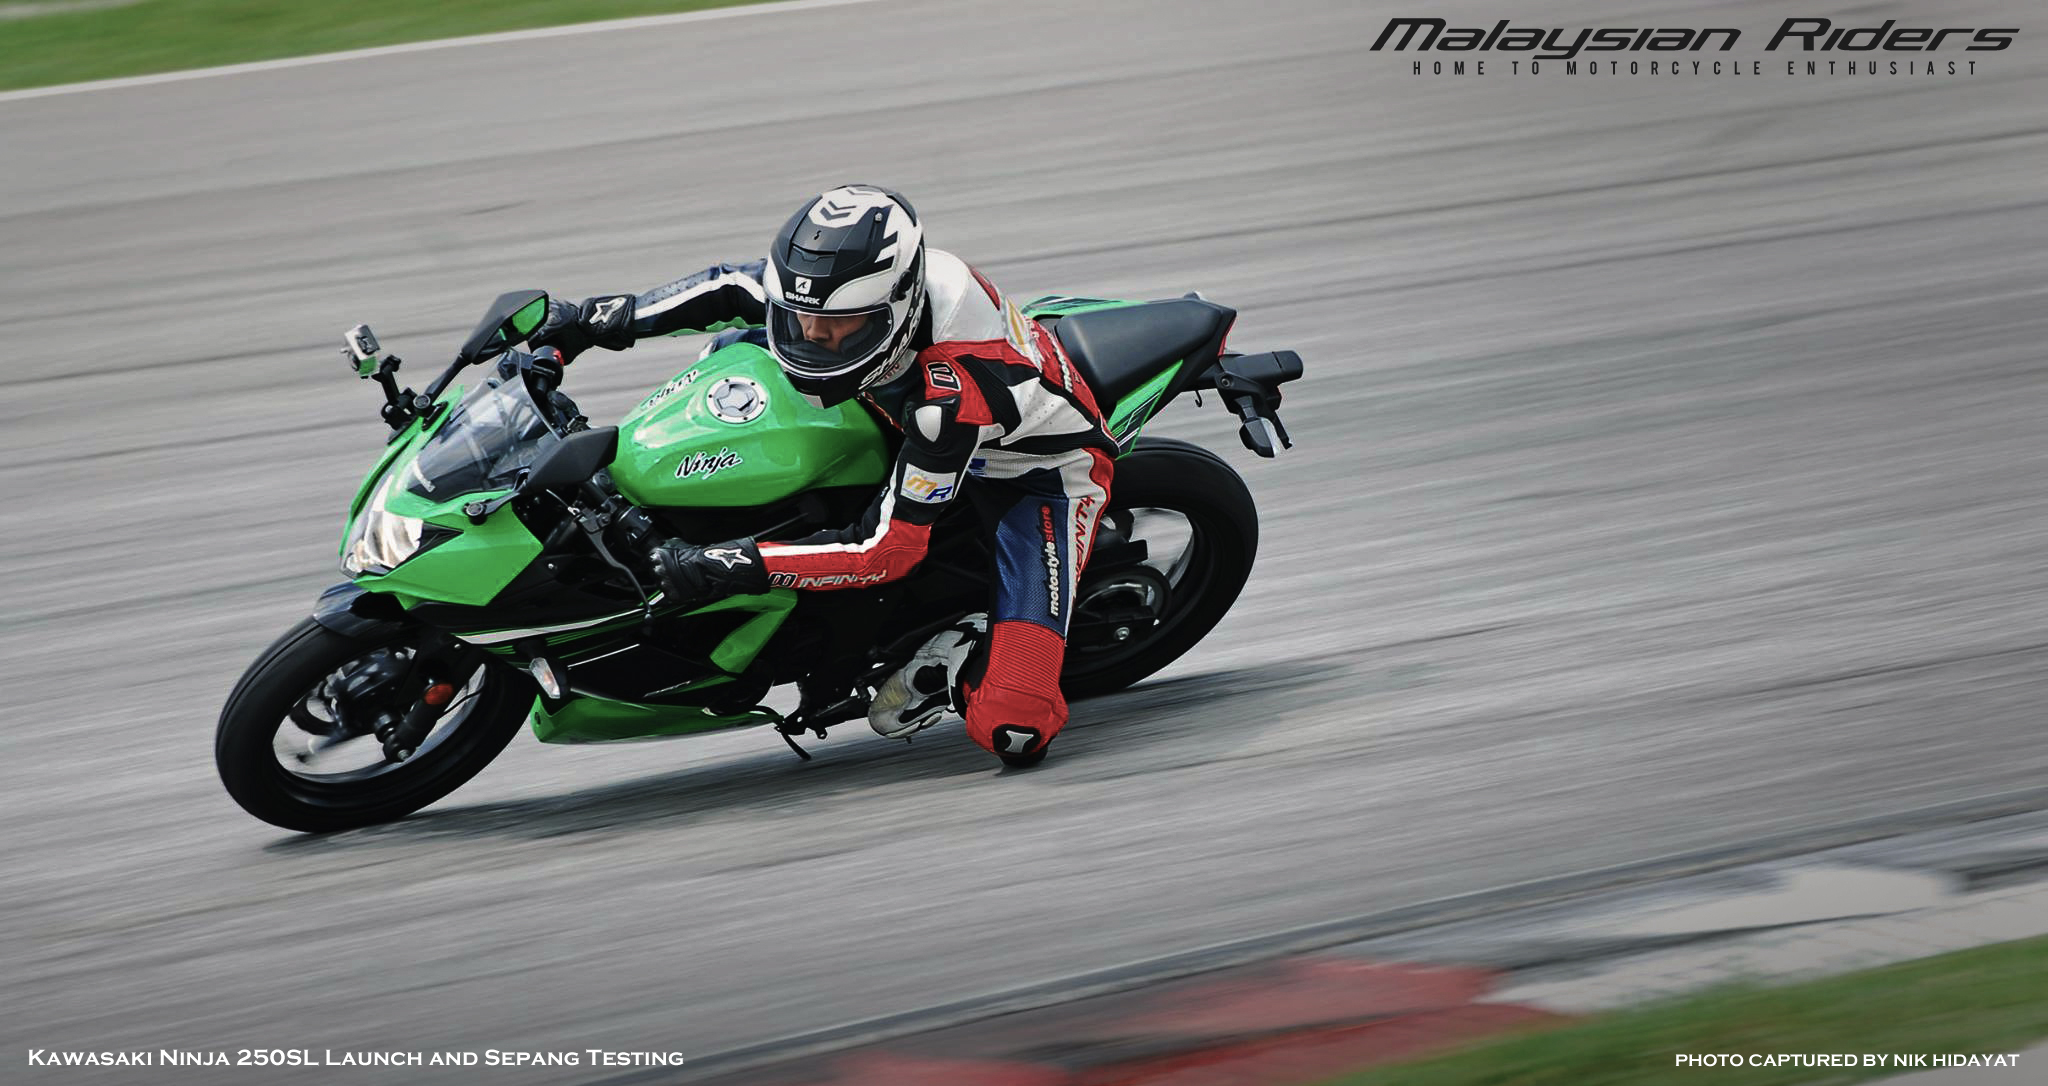 Motorcycle Update Kawasaki Ninja 150 Price In Pakistan